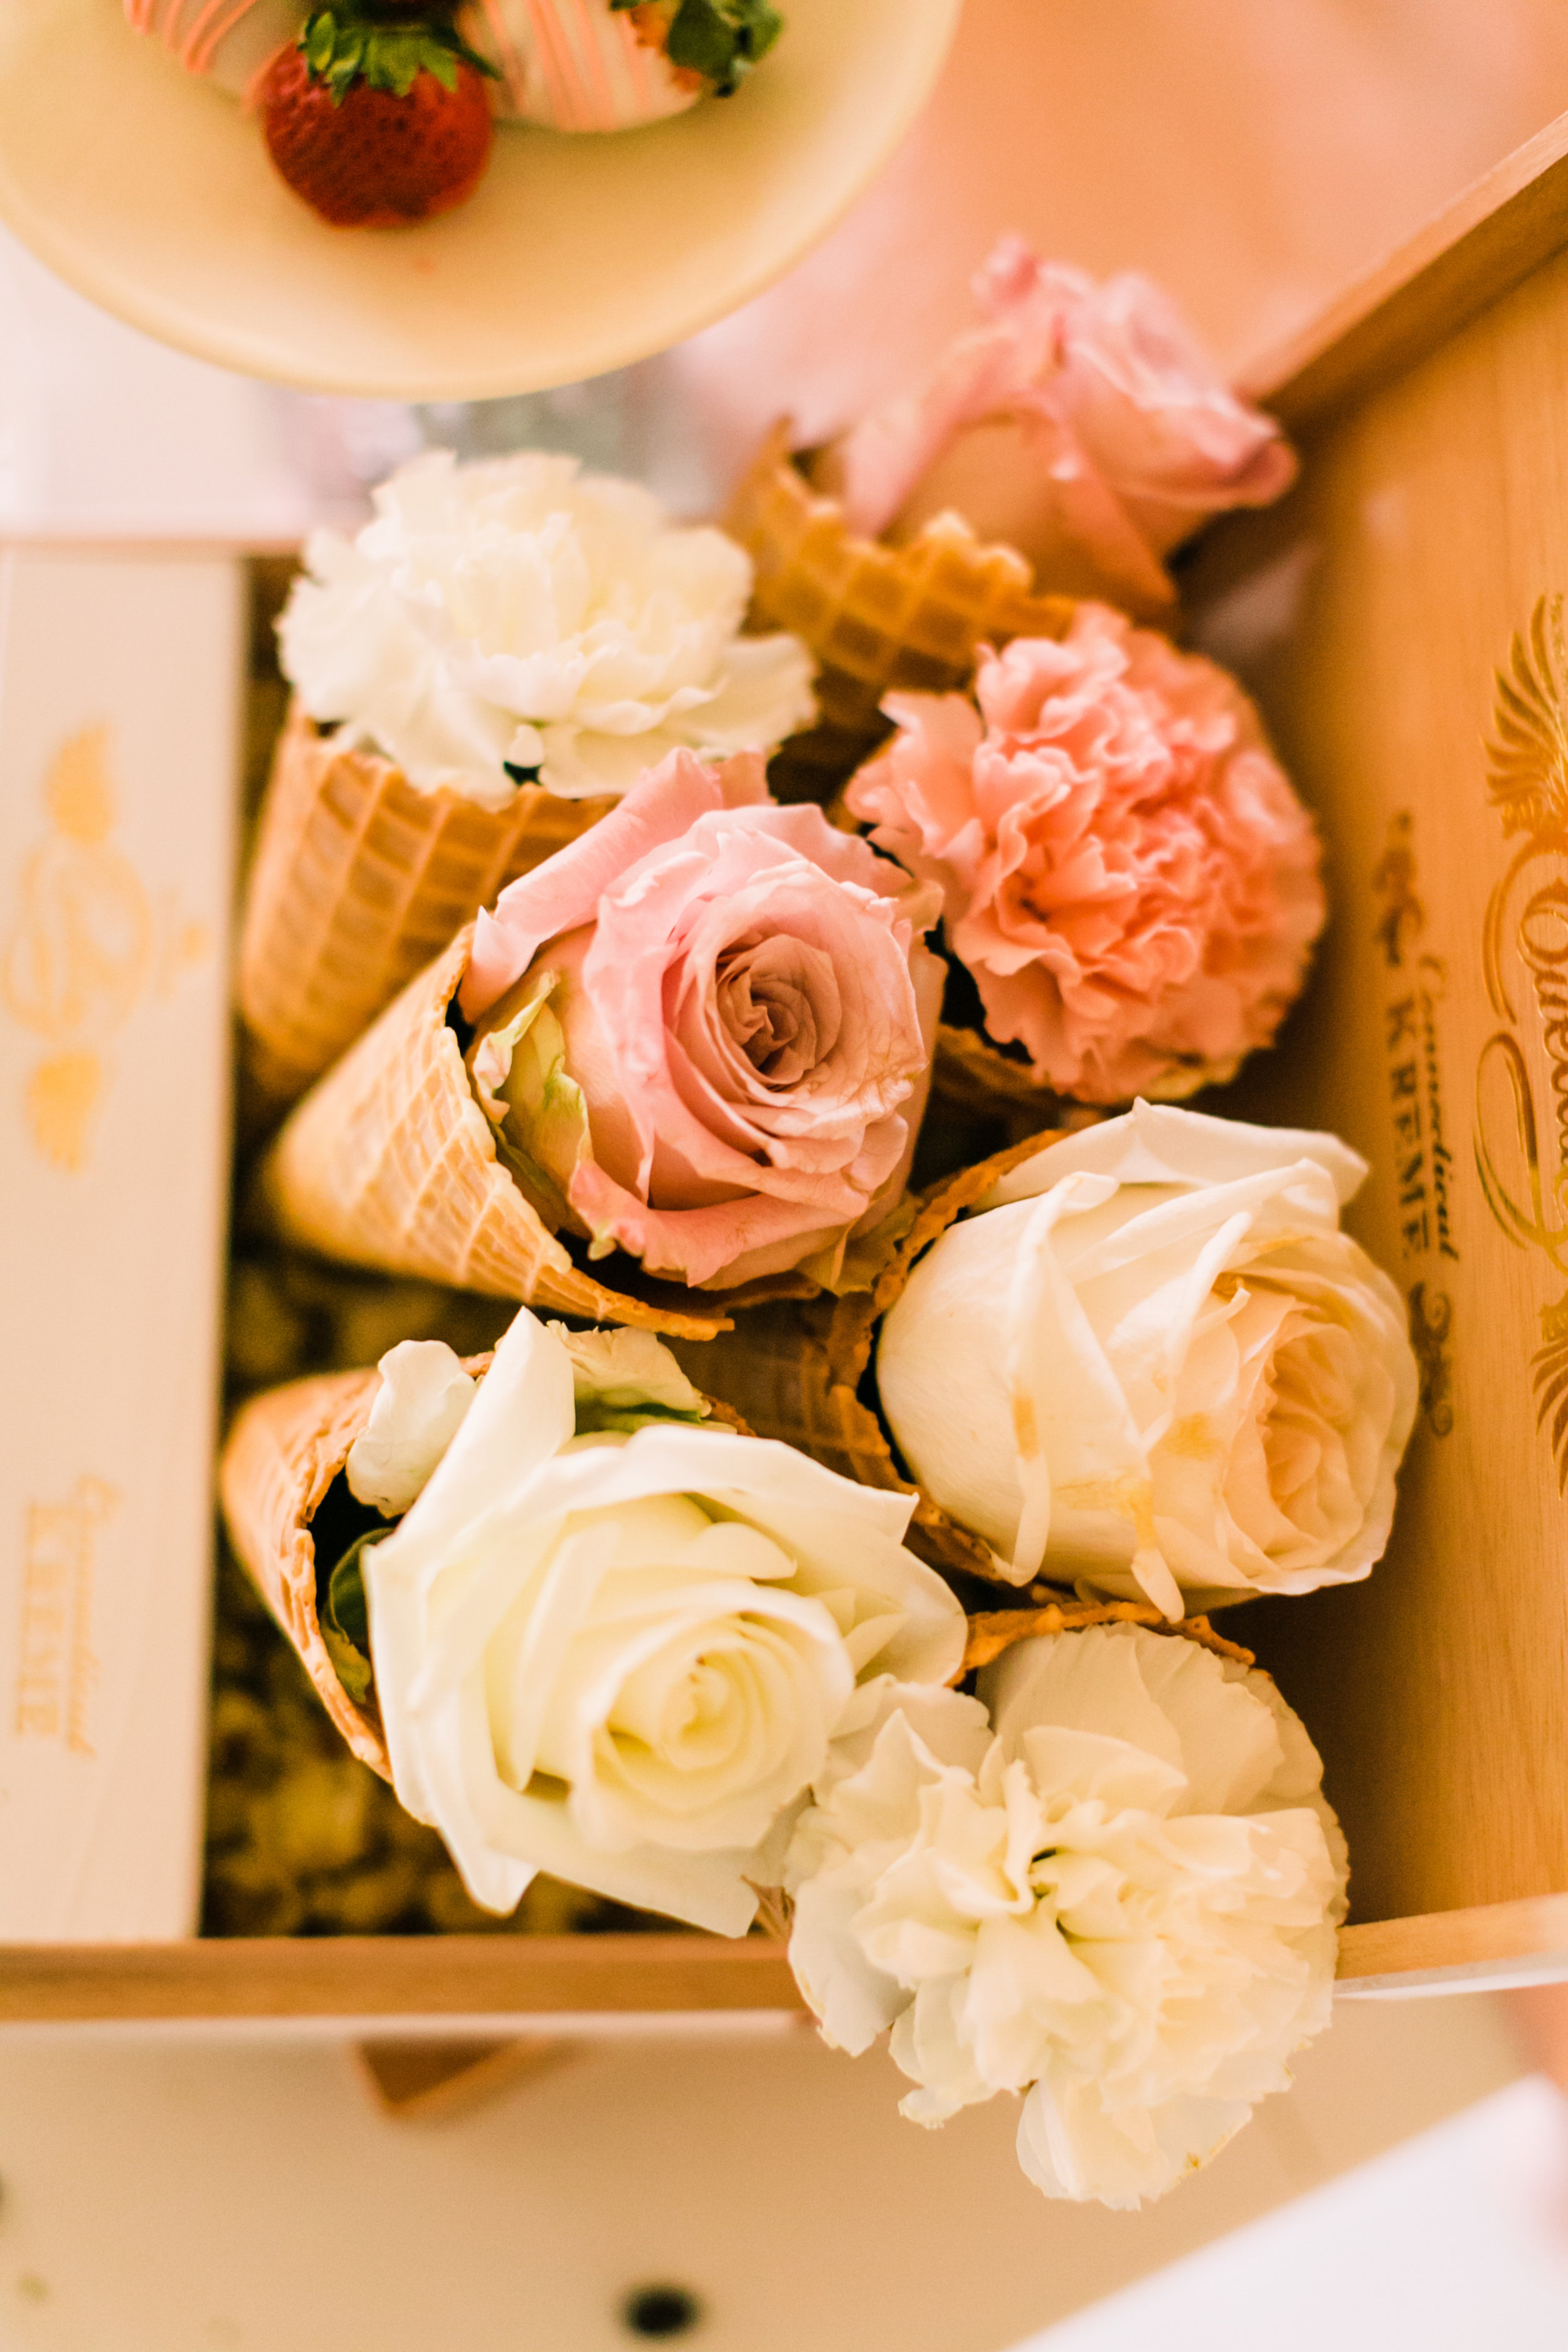 romantic+valentines+day+wedding+coffee (6 of 12).jpg